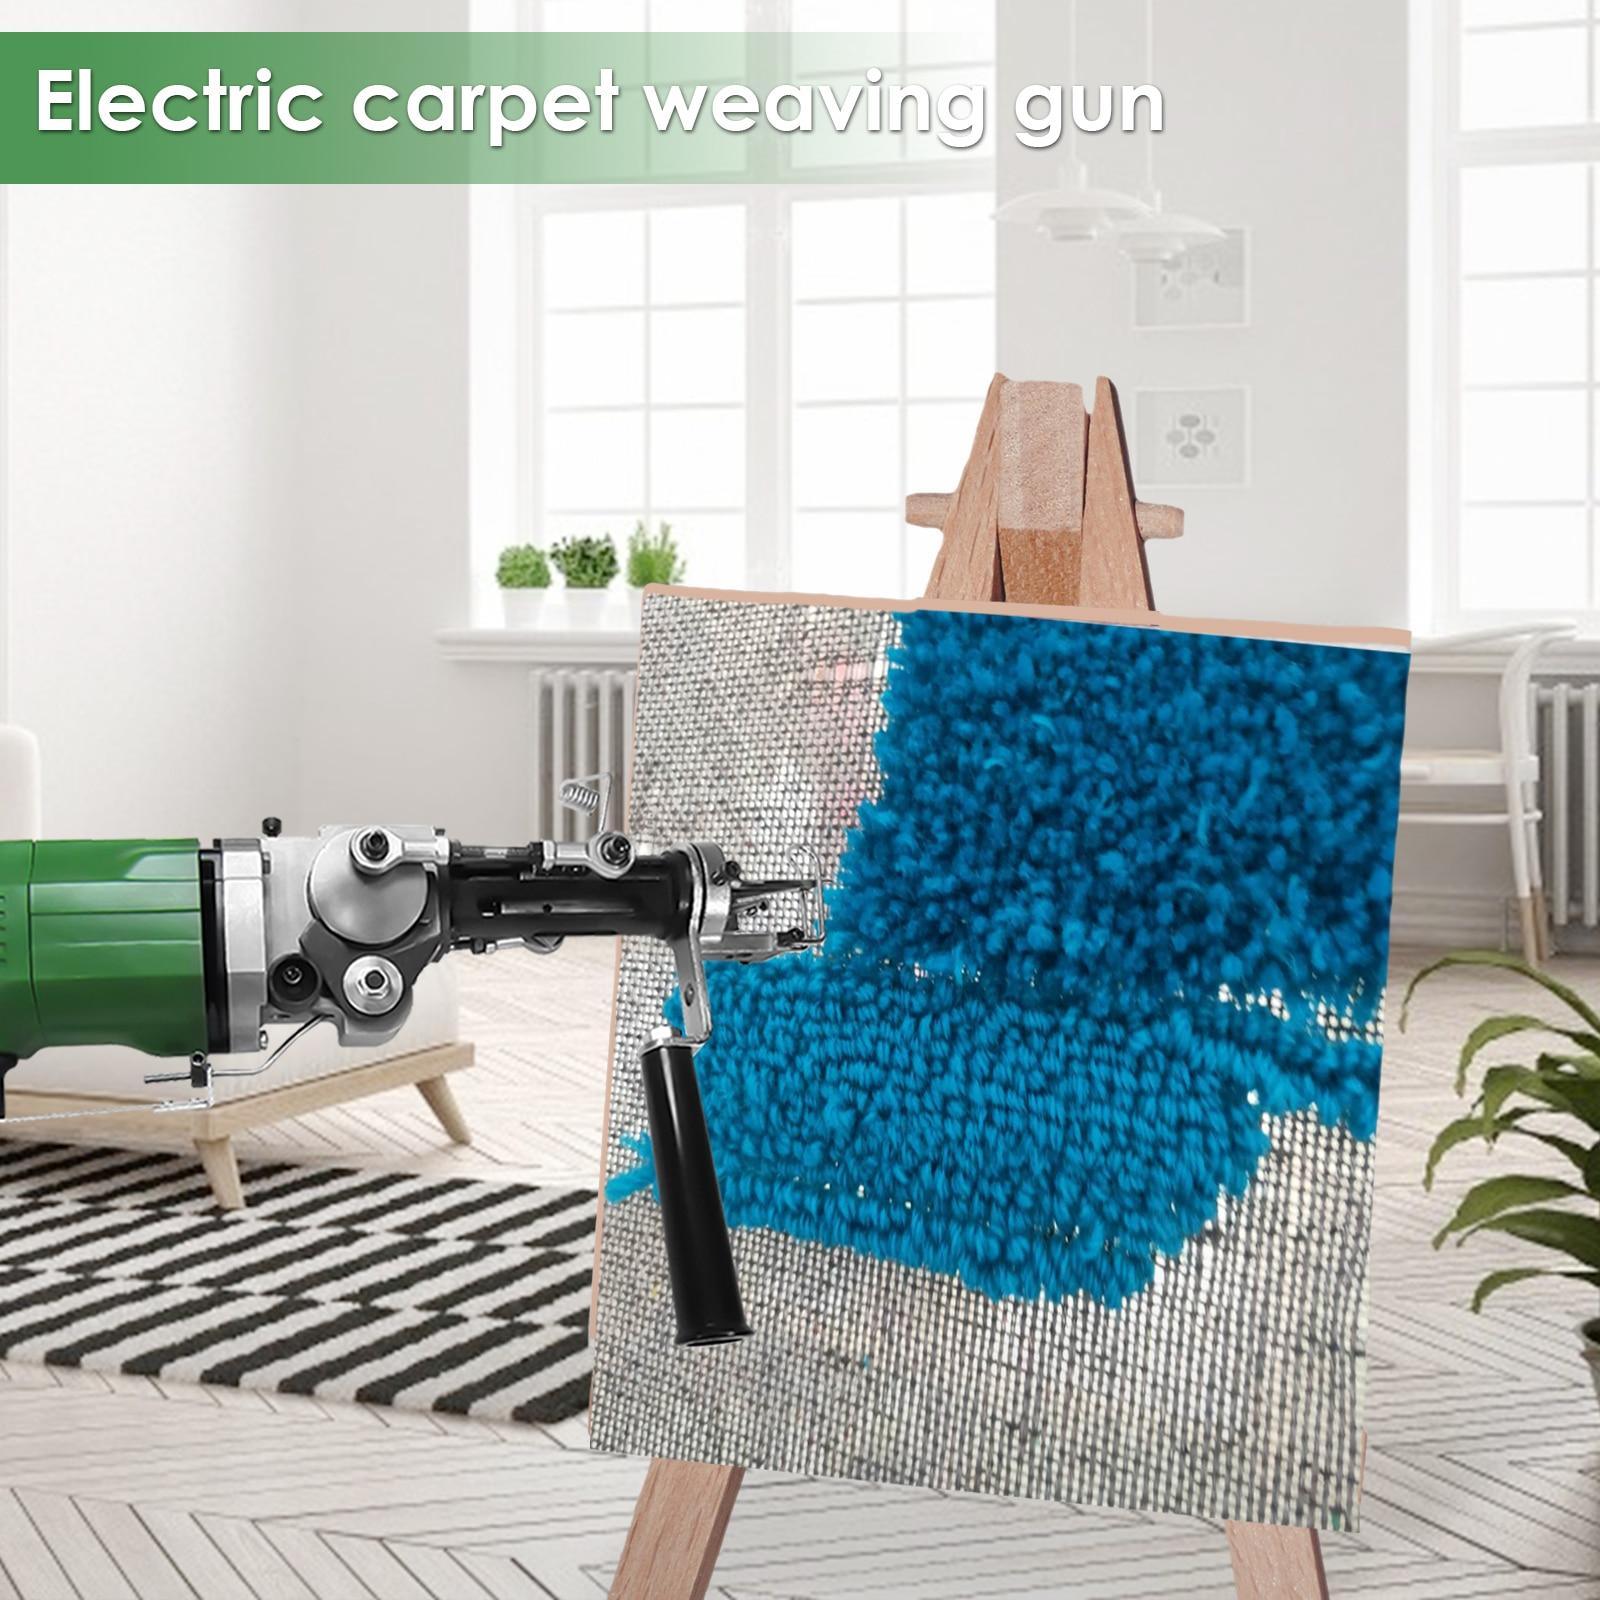 2 IN 1 Electric Carpet Weaving Tufting Gun Electric Hand Rug Tufting Machines Rug Making Tools Do Both Cut Pile And Loop Pile enlarge